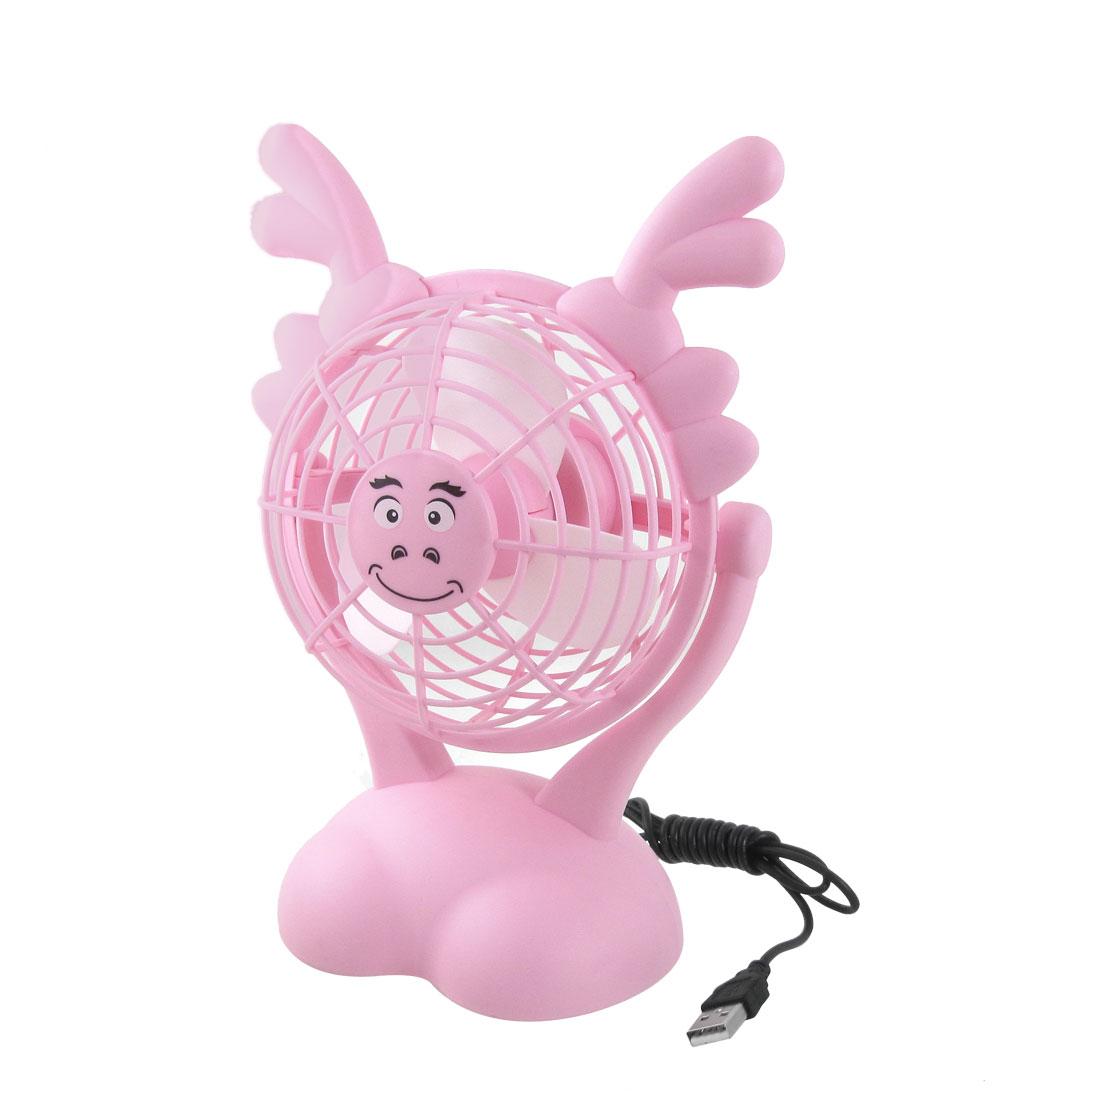 Pink Plastic White Foam Paddles Batteries USB Powered Button Fan